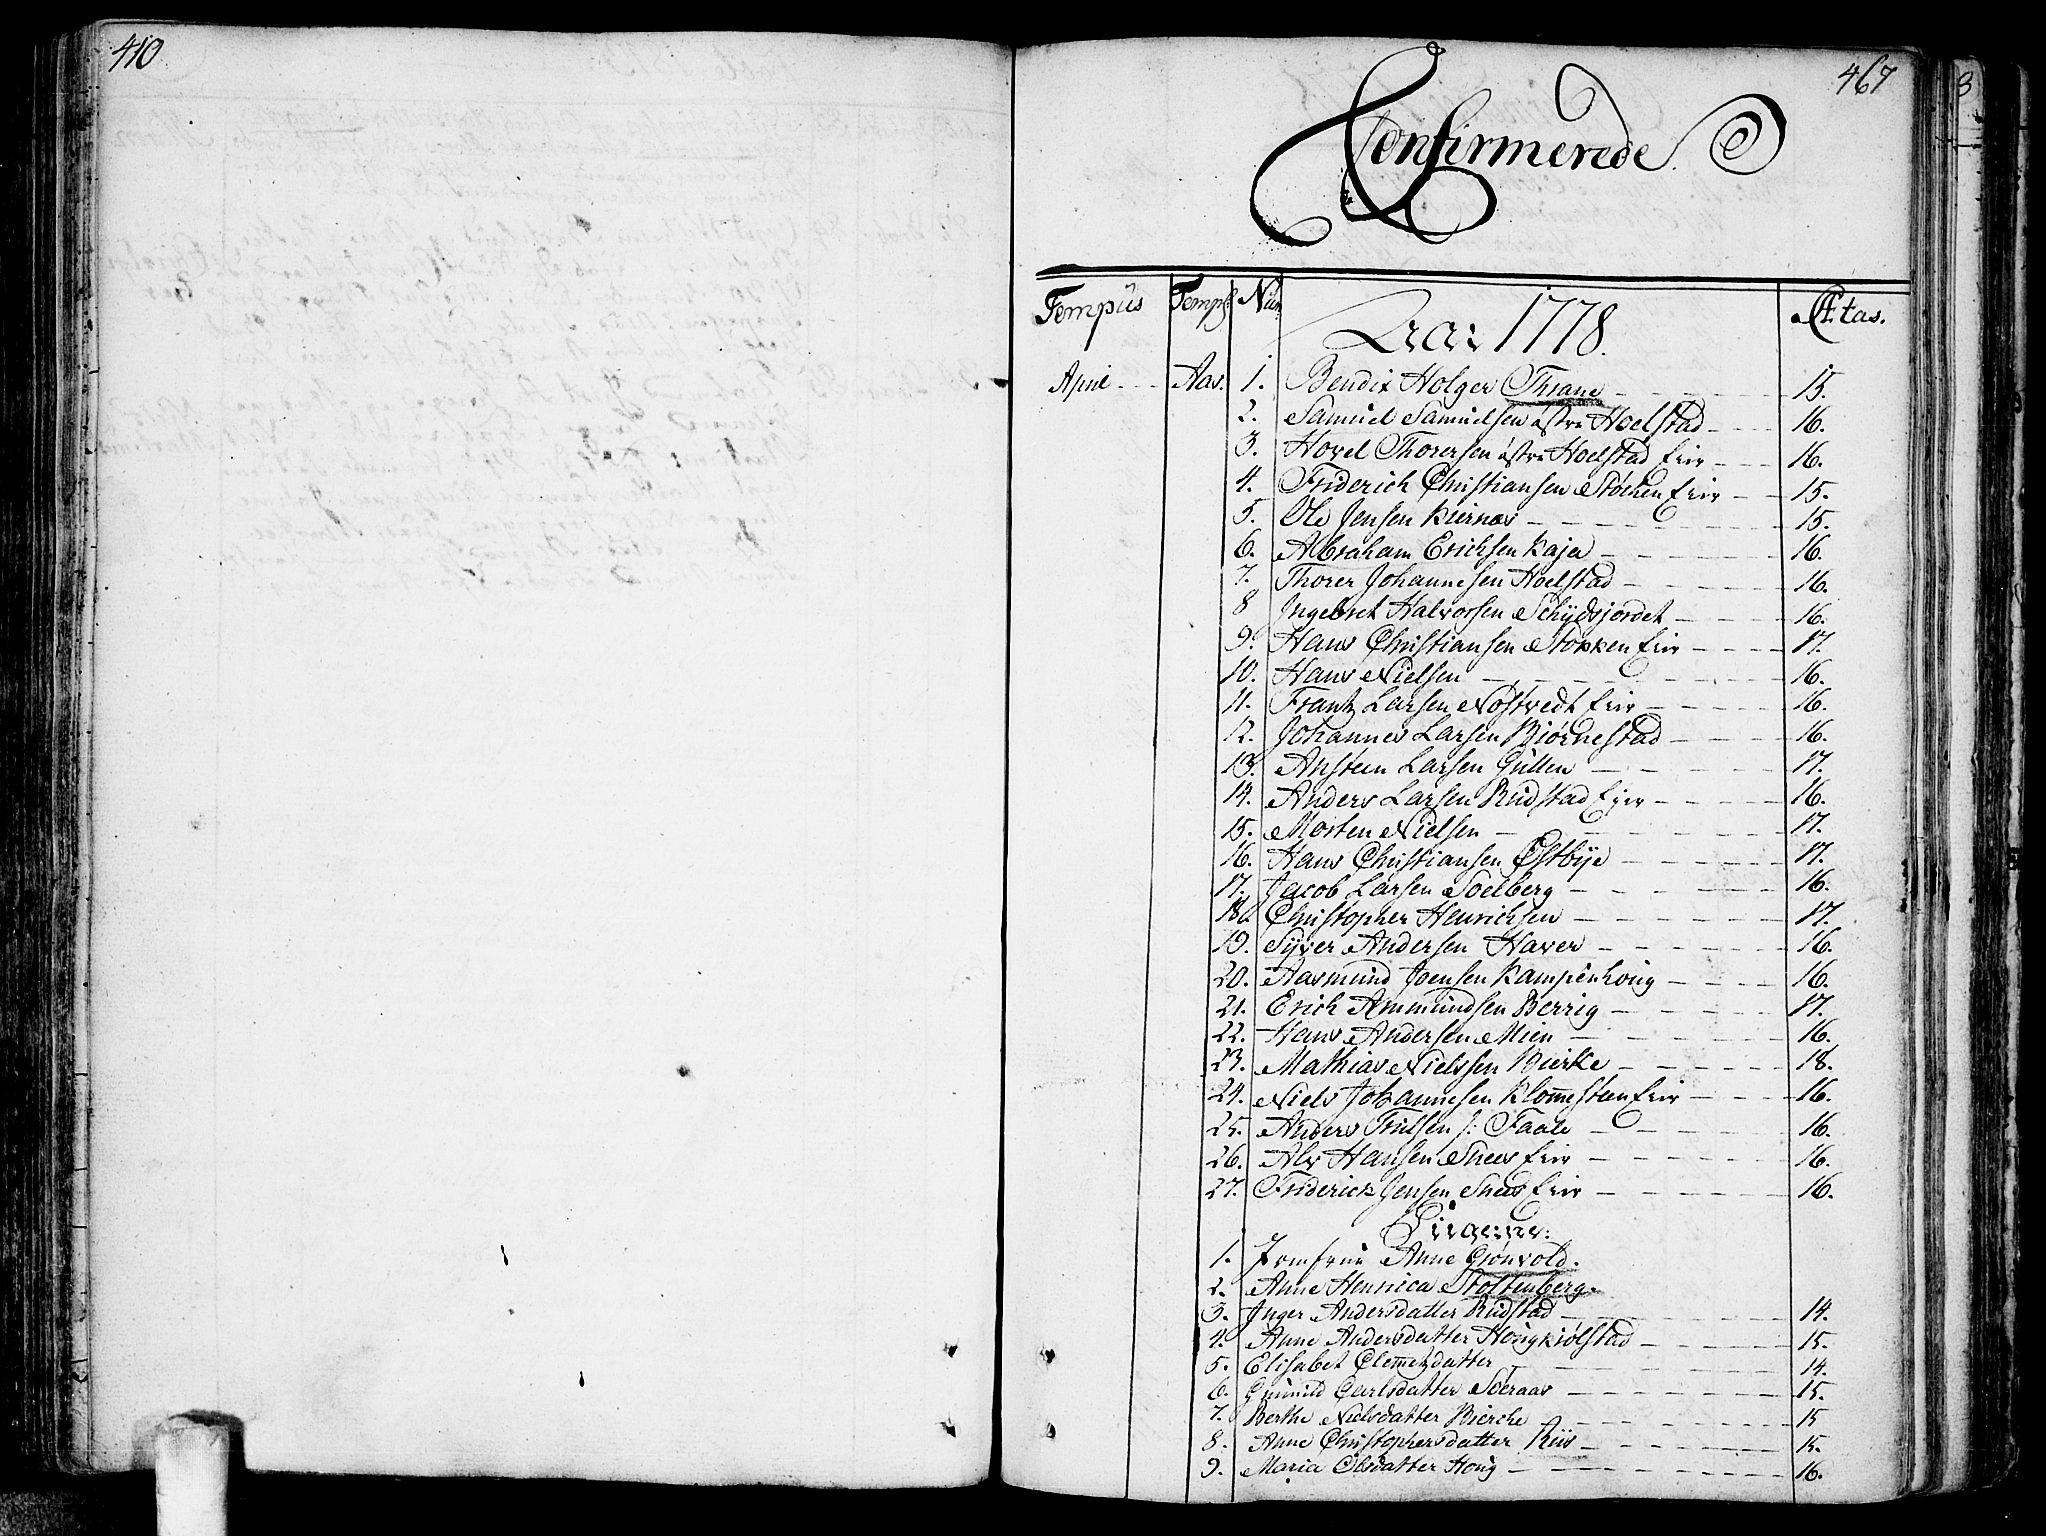 SAO, Ås prestekontor Kirkebøker, F/Fa/L0002: Ministerialbok nr. I 2, 1778-1813, s. 467